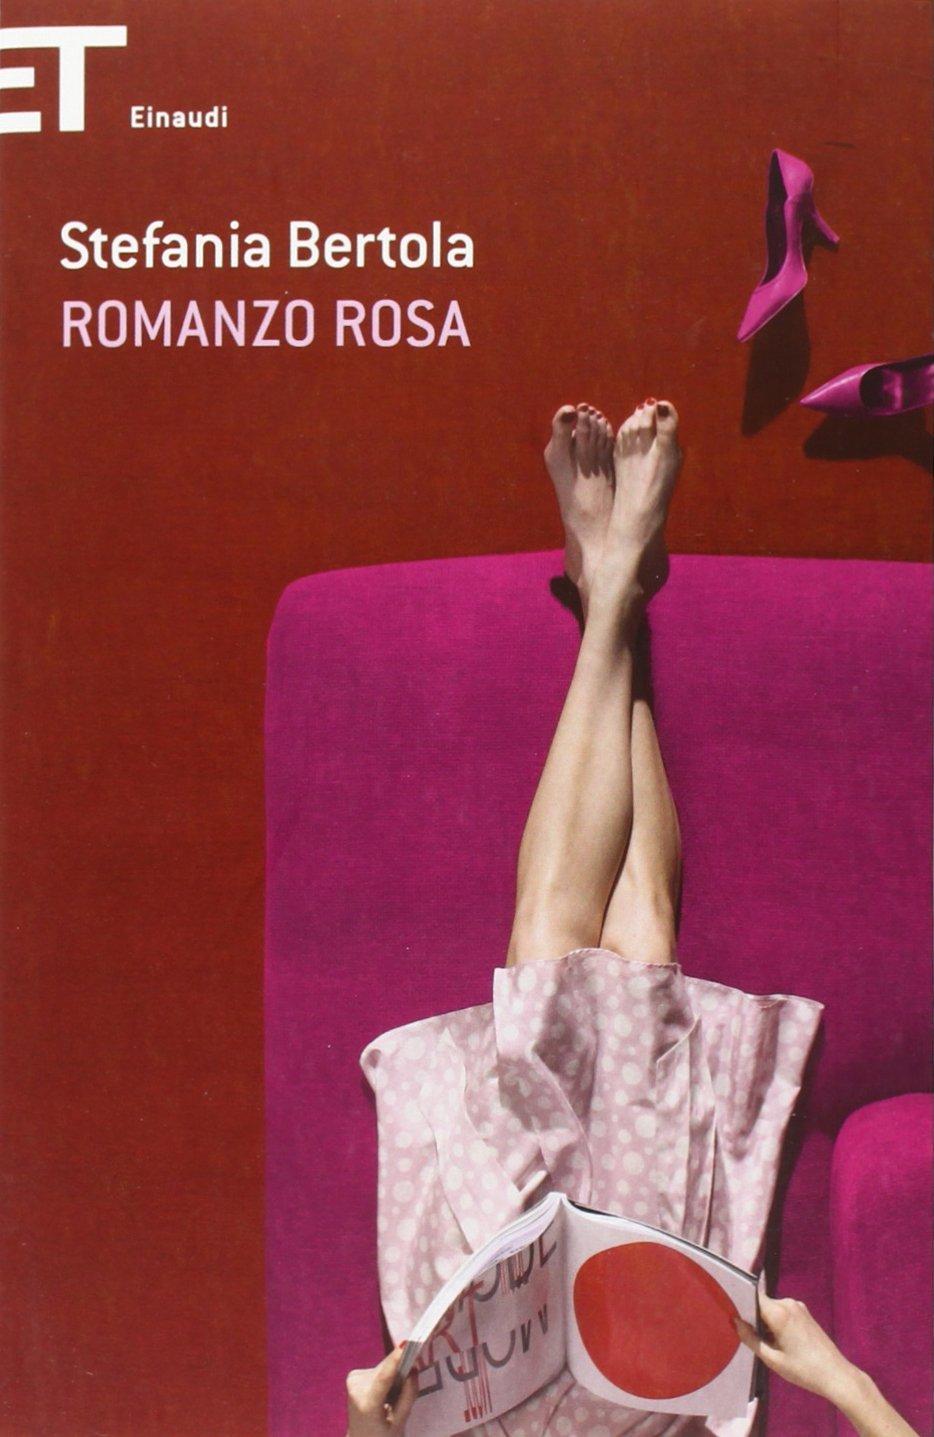 Romanzo rosa Copertina flessibile – 30 apr 2012 Stefania Bertola Einaudi 8806209787 LETTERATURA ITALIANA: TESTI